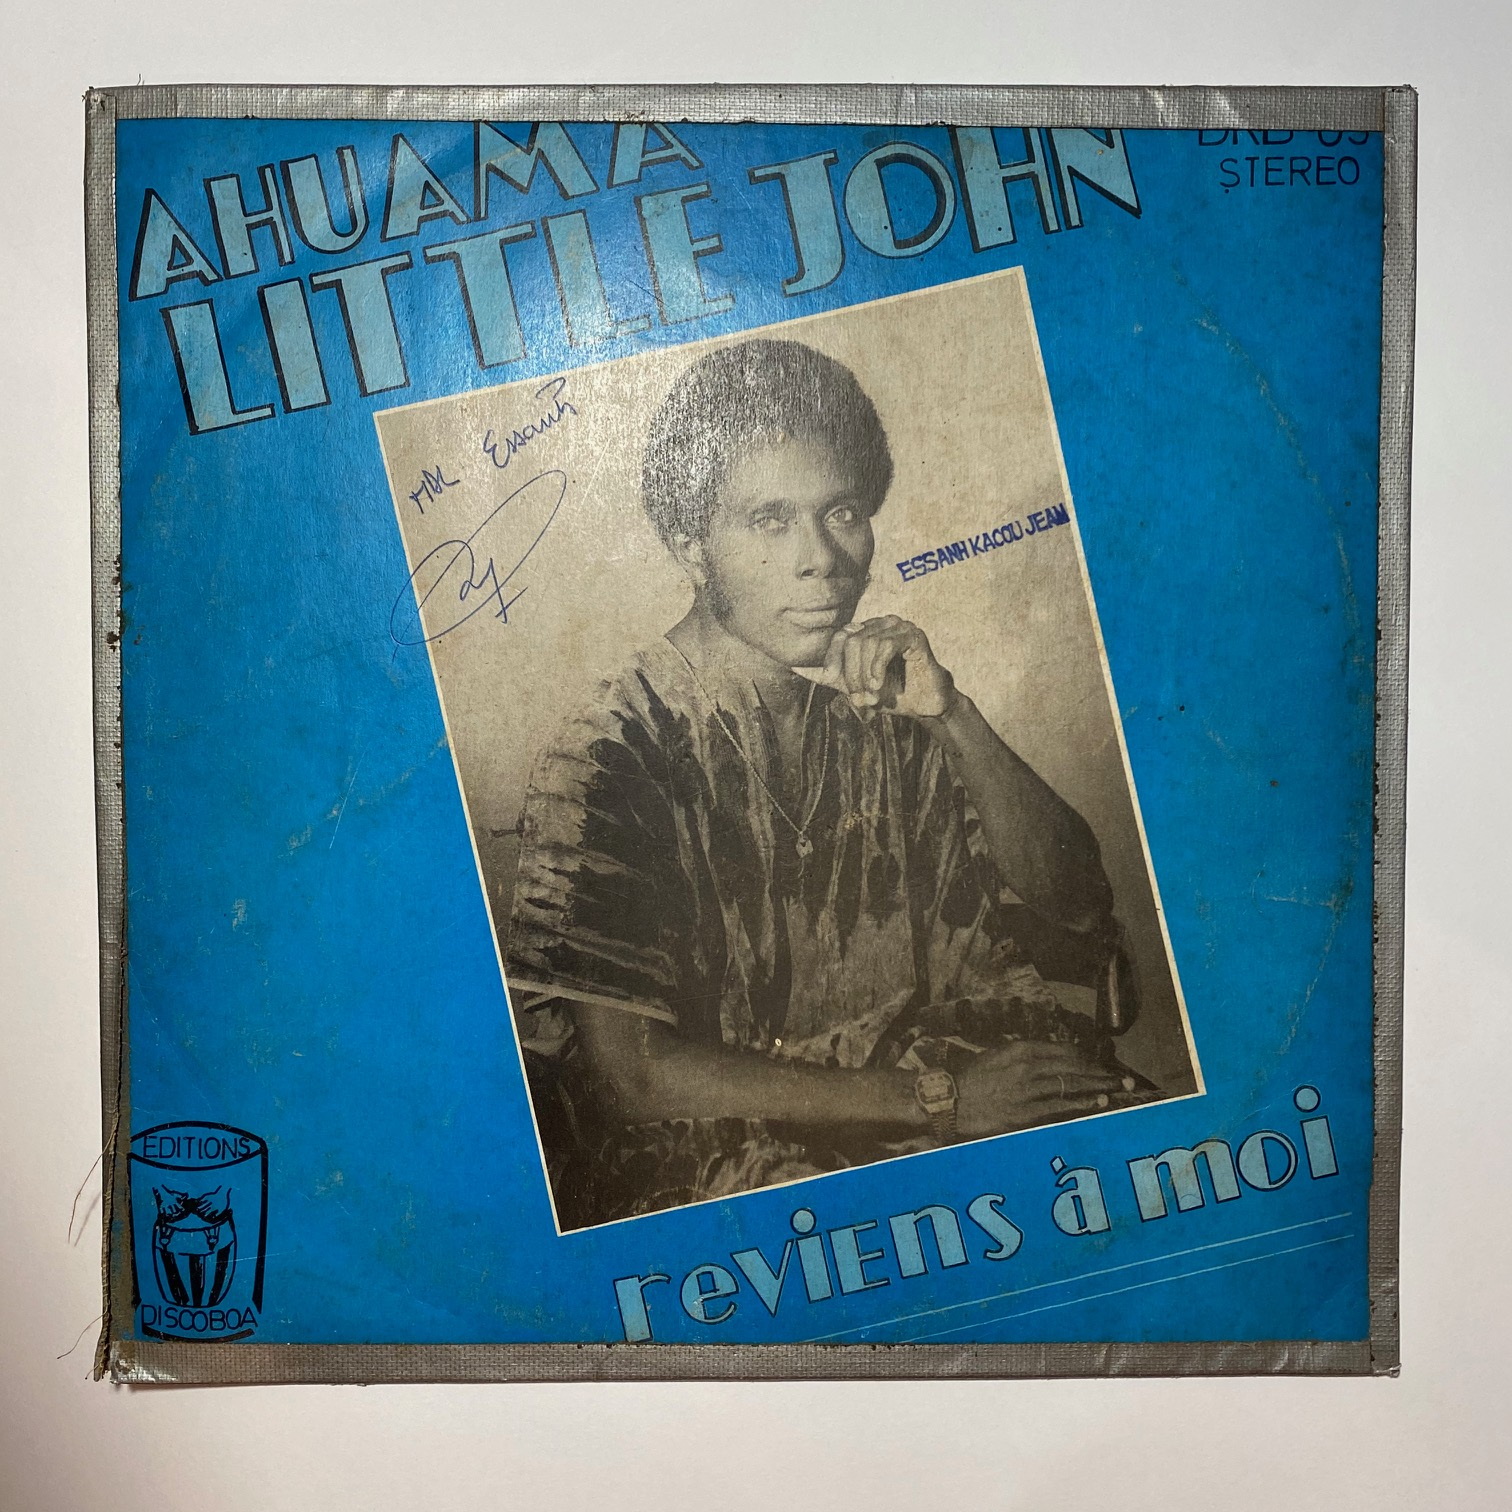 AHUAMA LITTLE JOHN - Reviens a moi - 33T